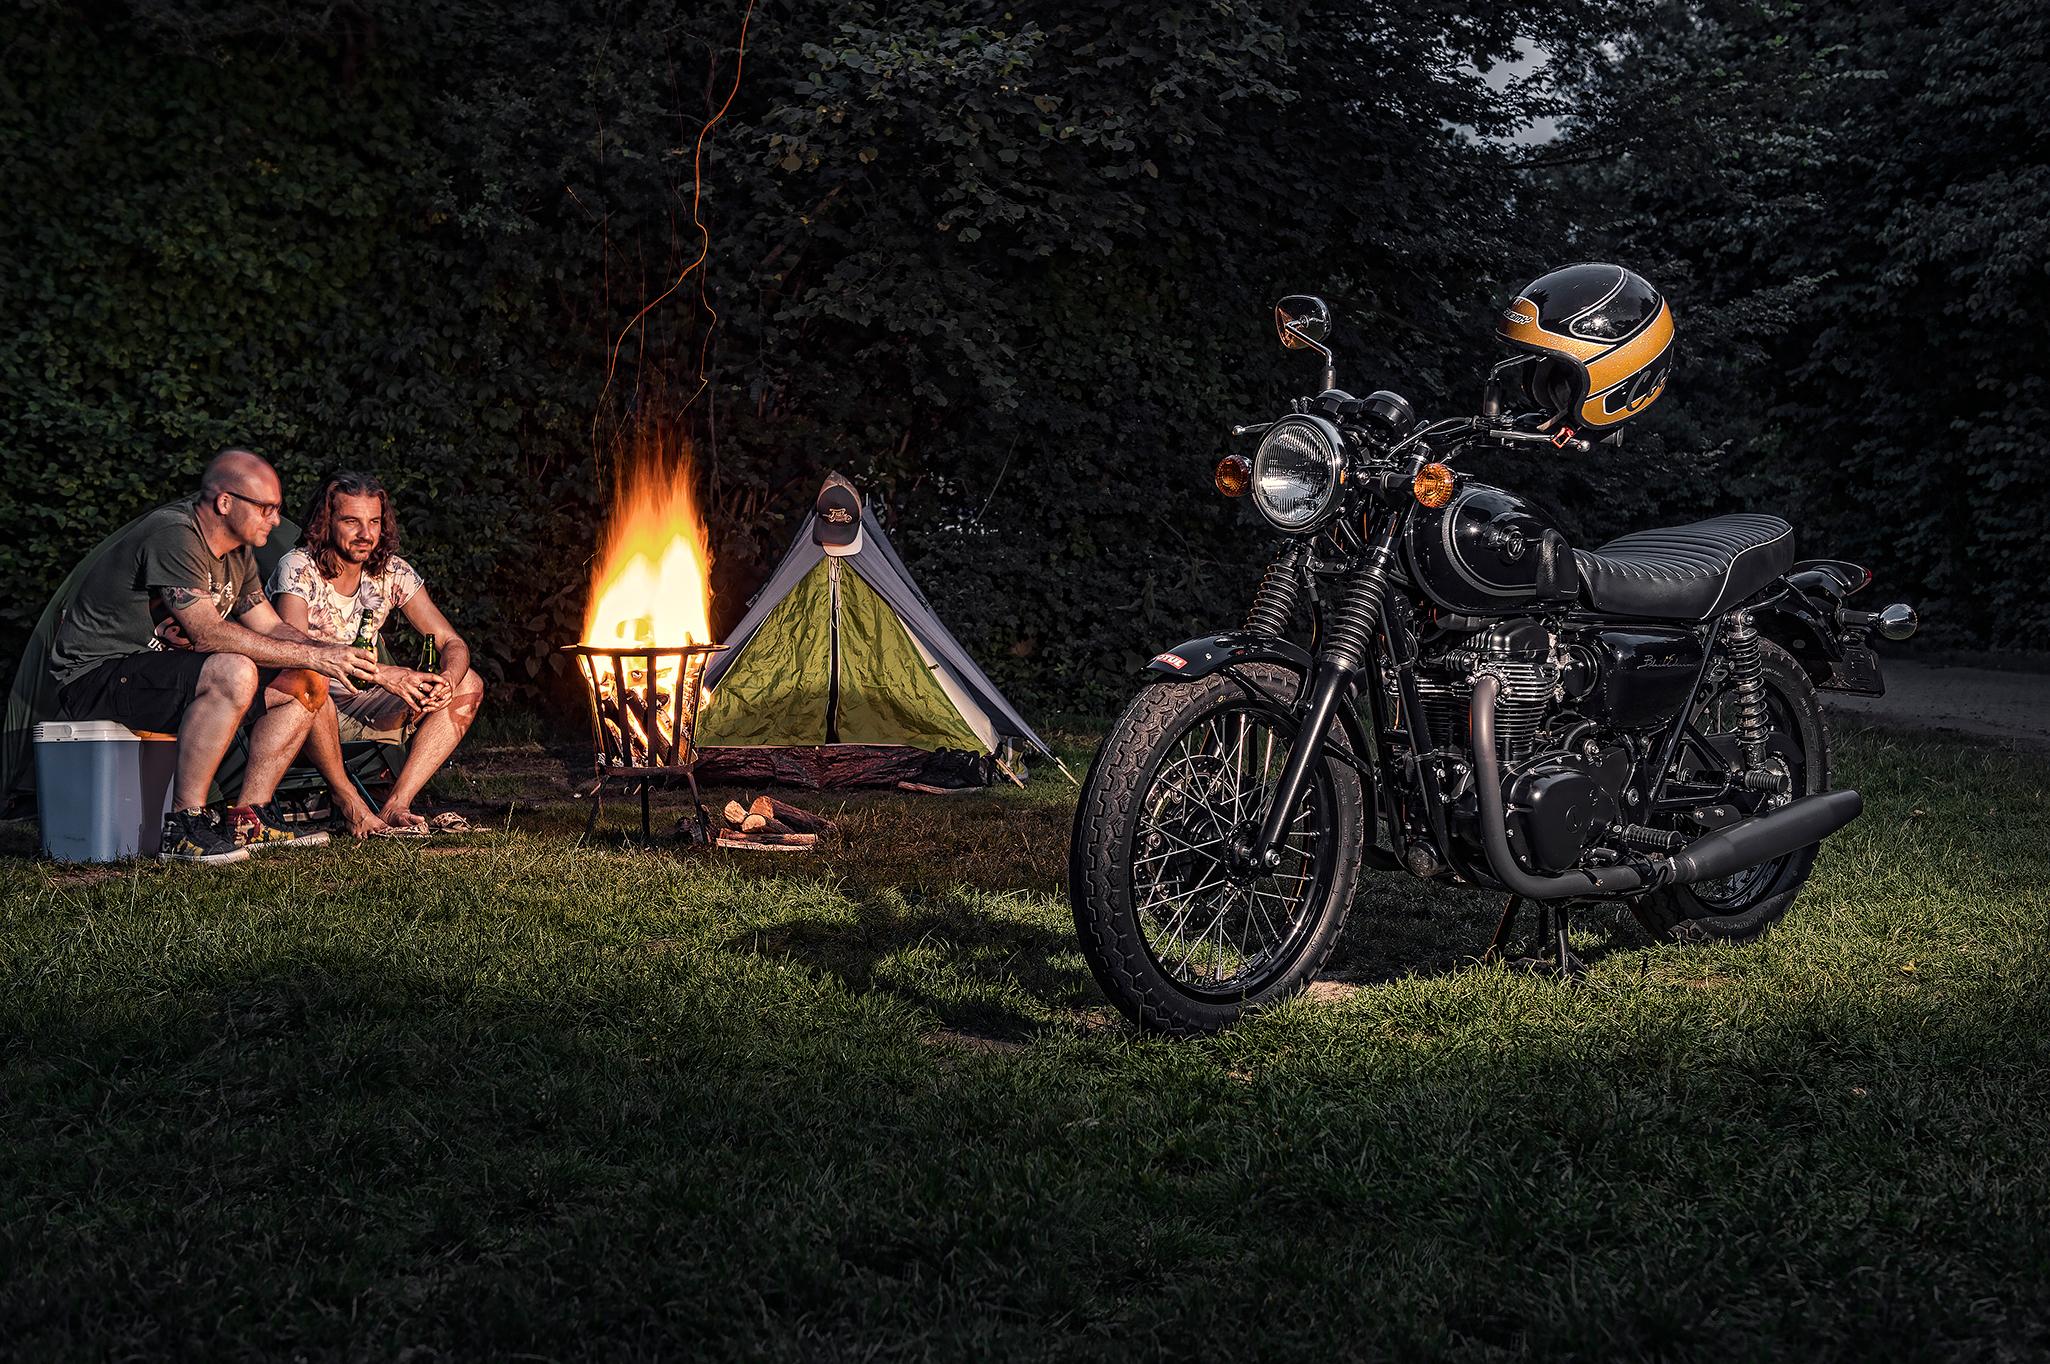 camping_32.jpg